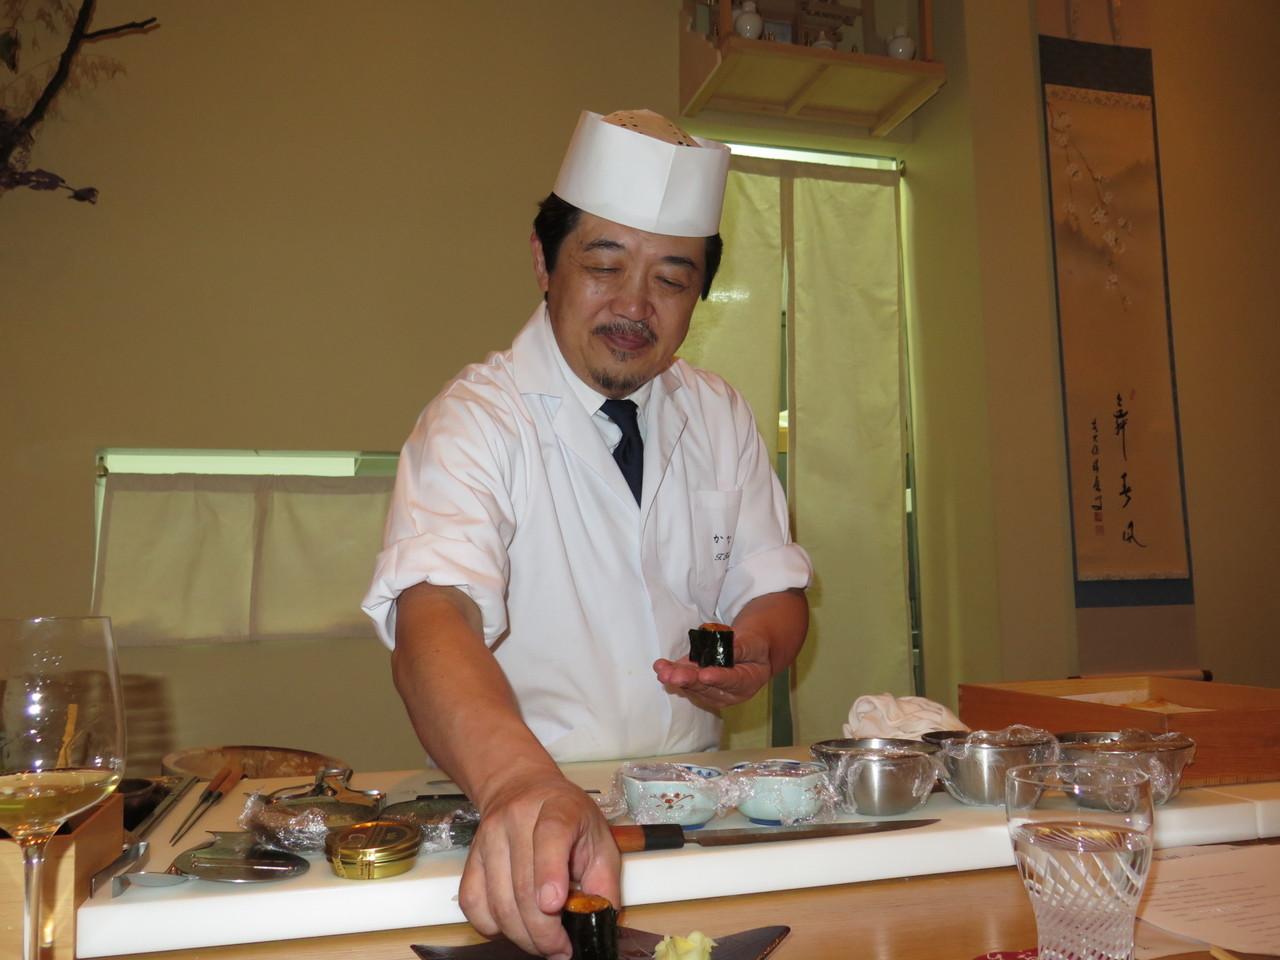 Tomoaki Kanazawa